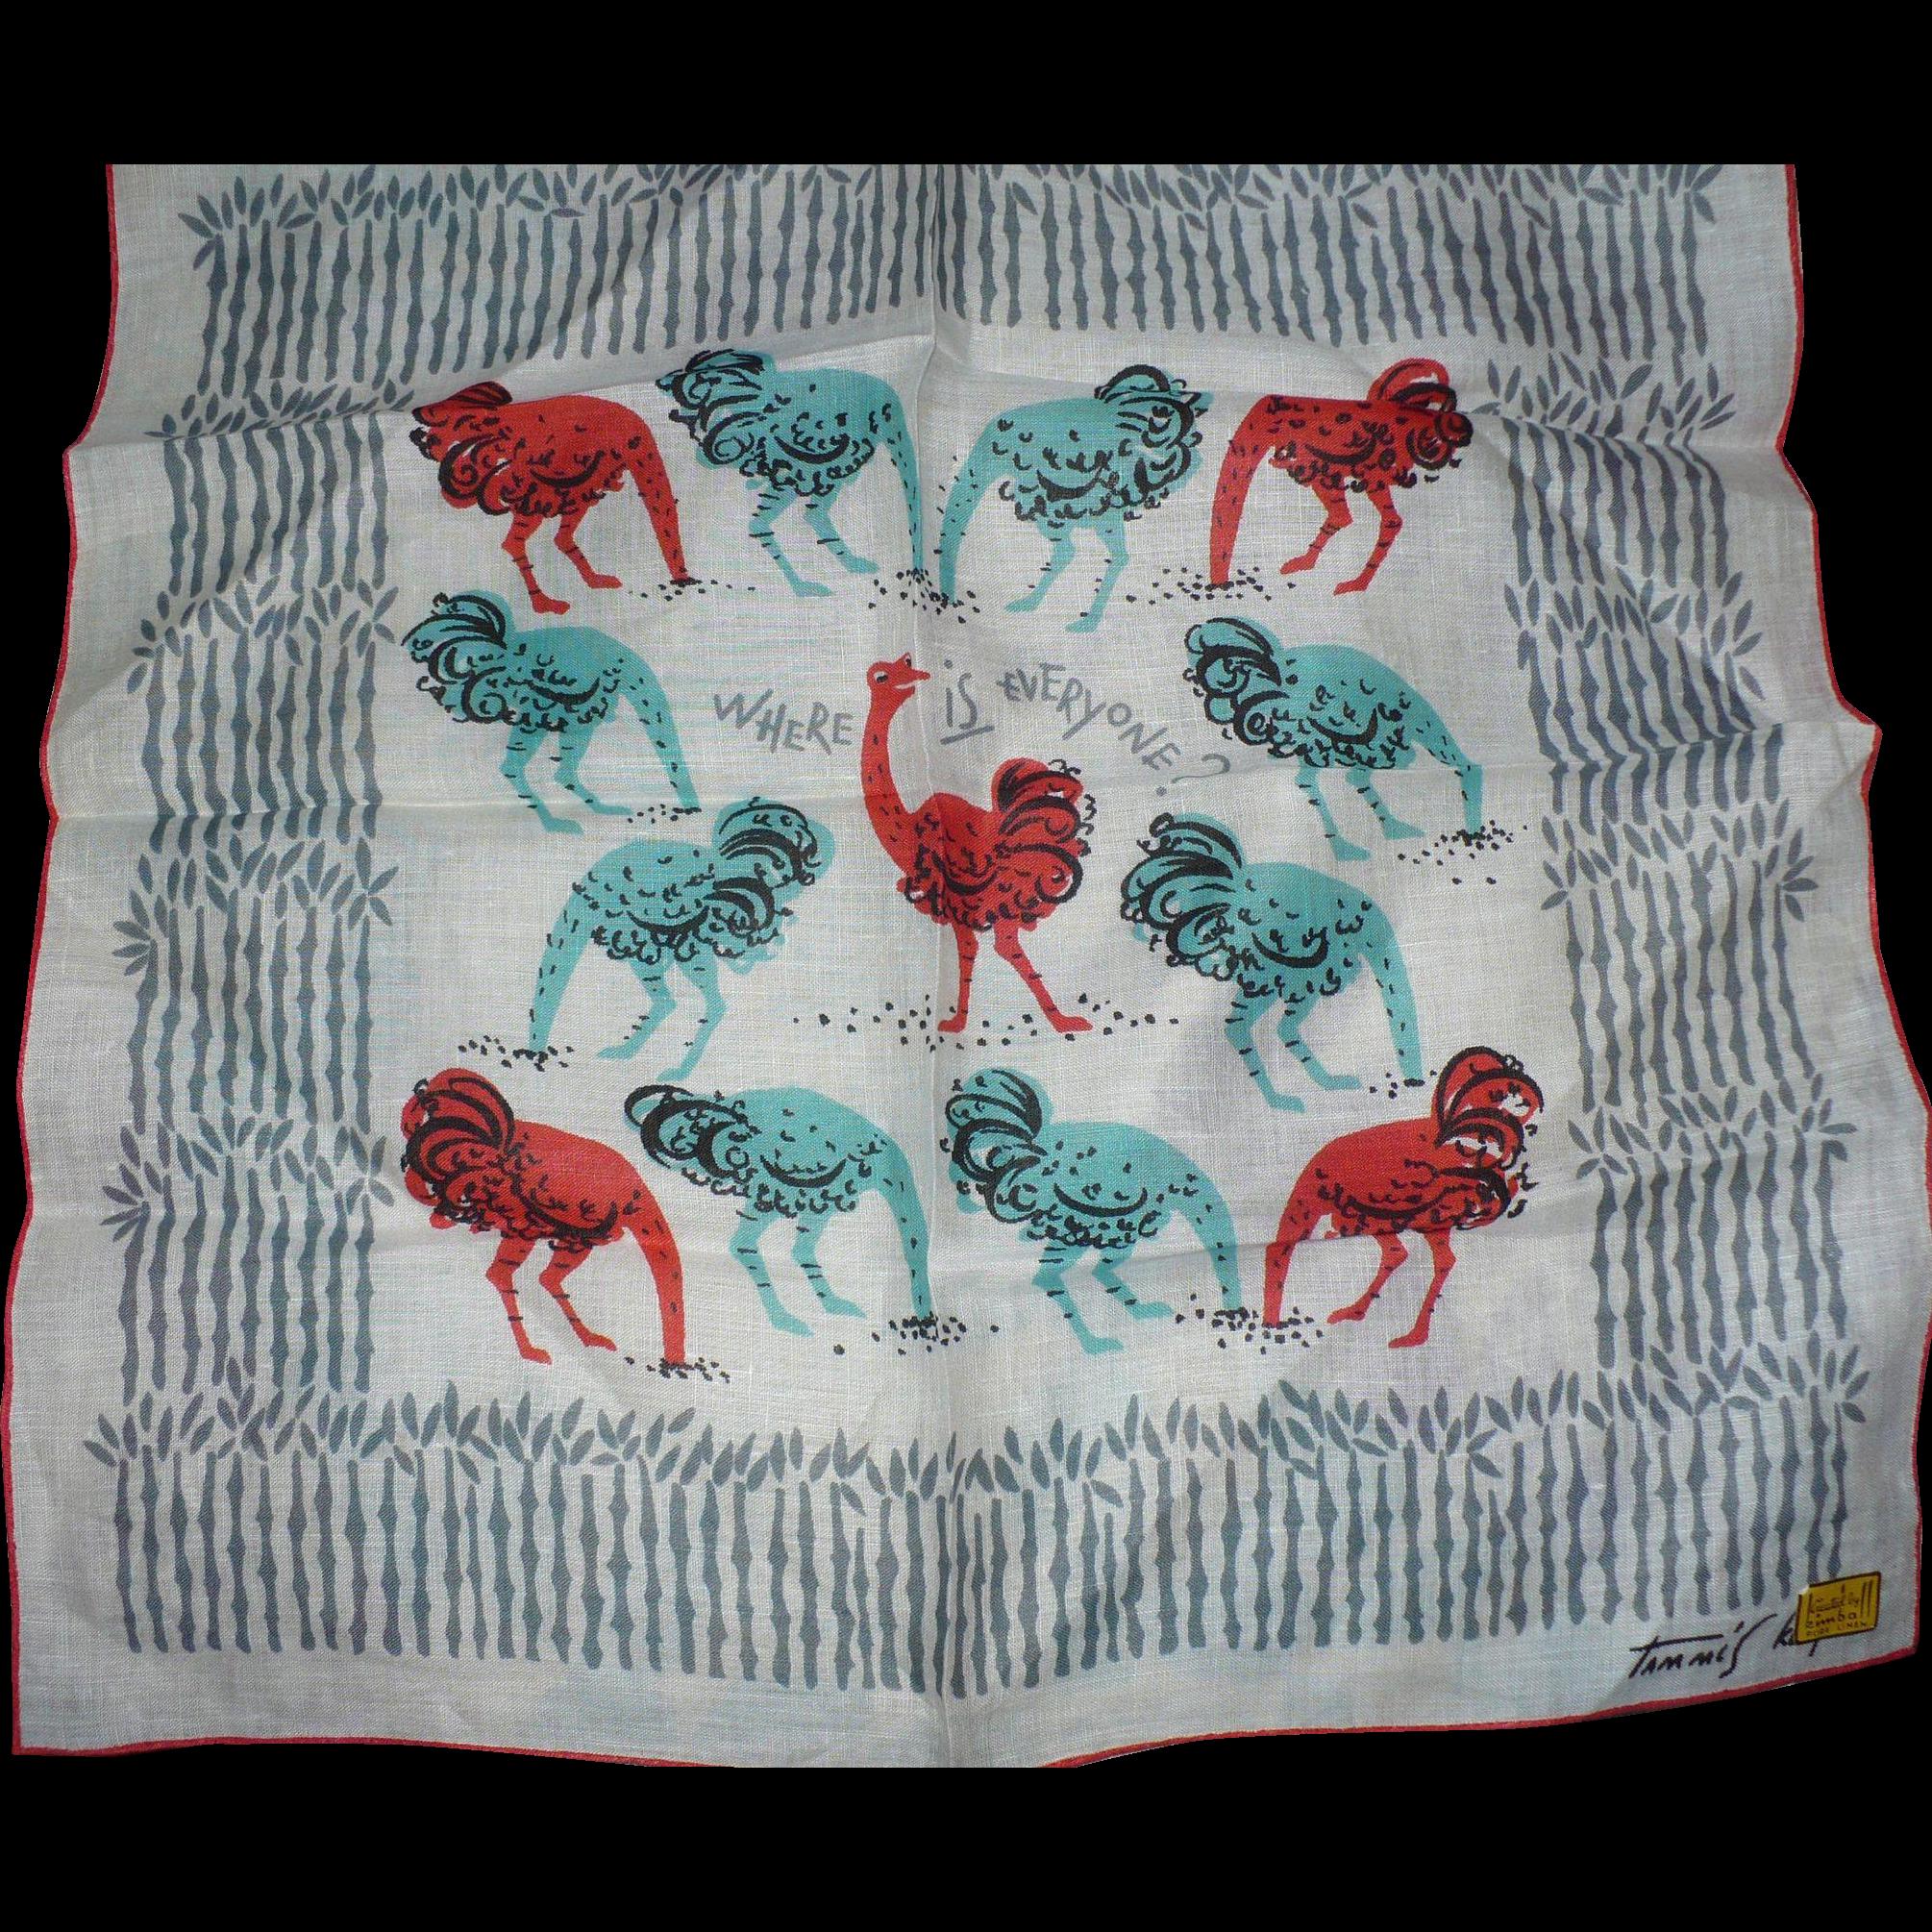 Napkin clipart handkerchief. Tammis keefe ostrich handkerchiefs